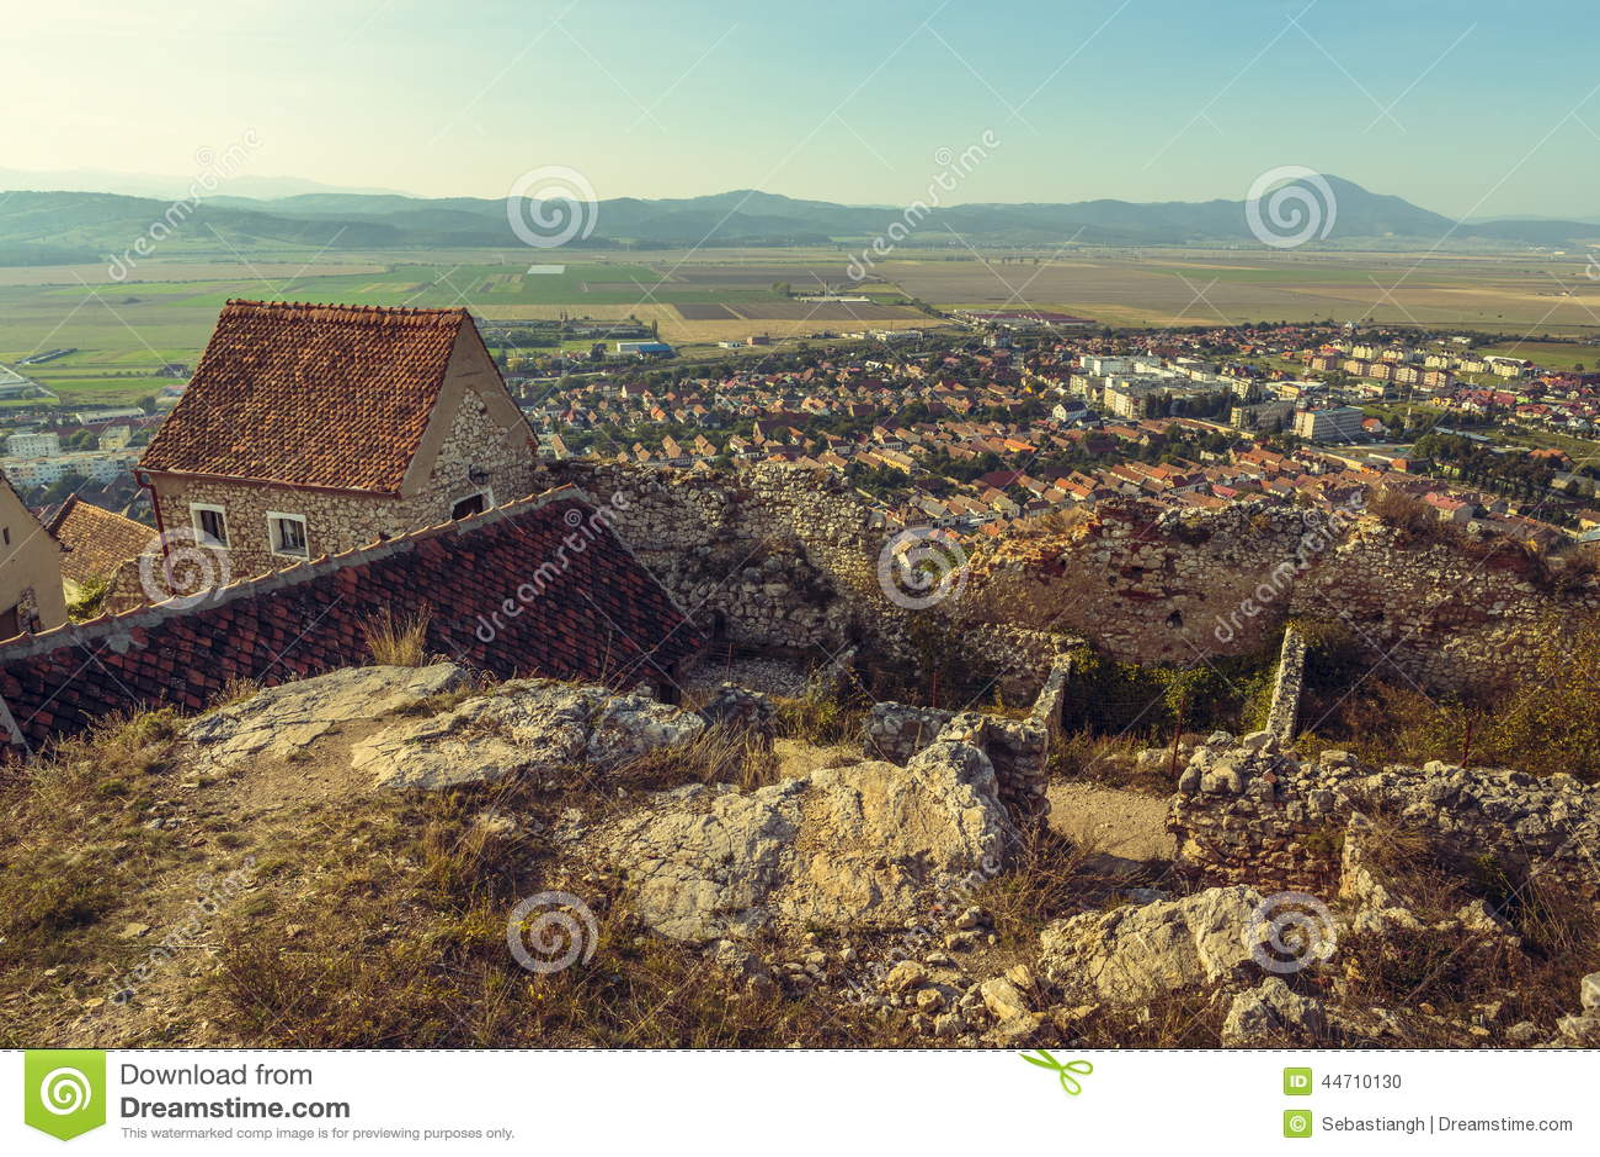 Ruins of Rasnov citadel